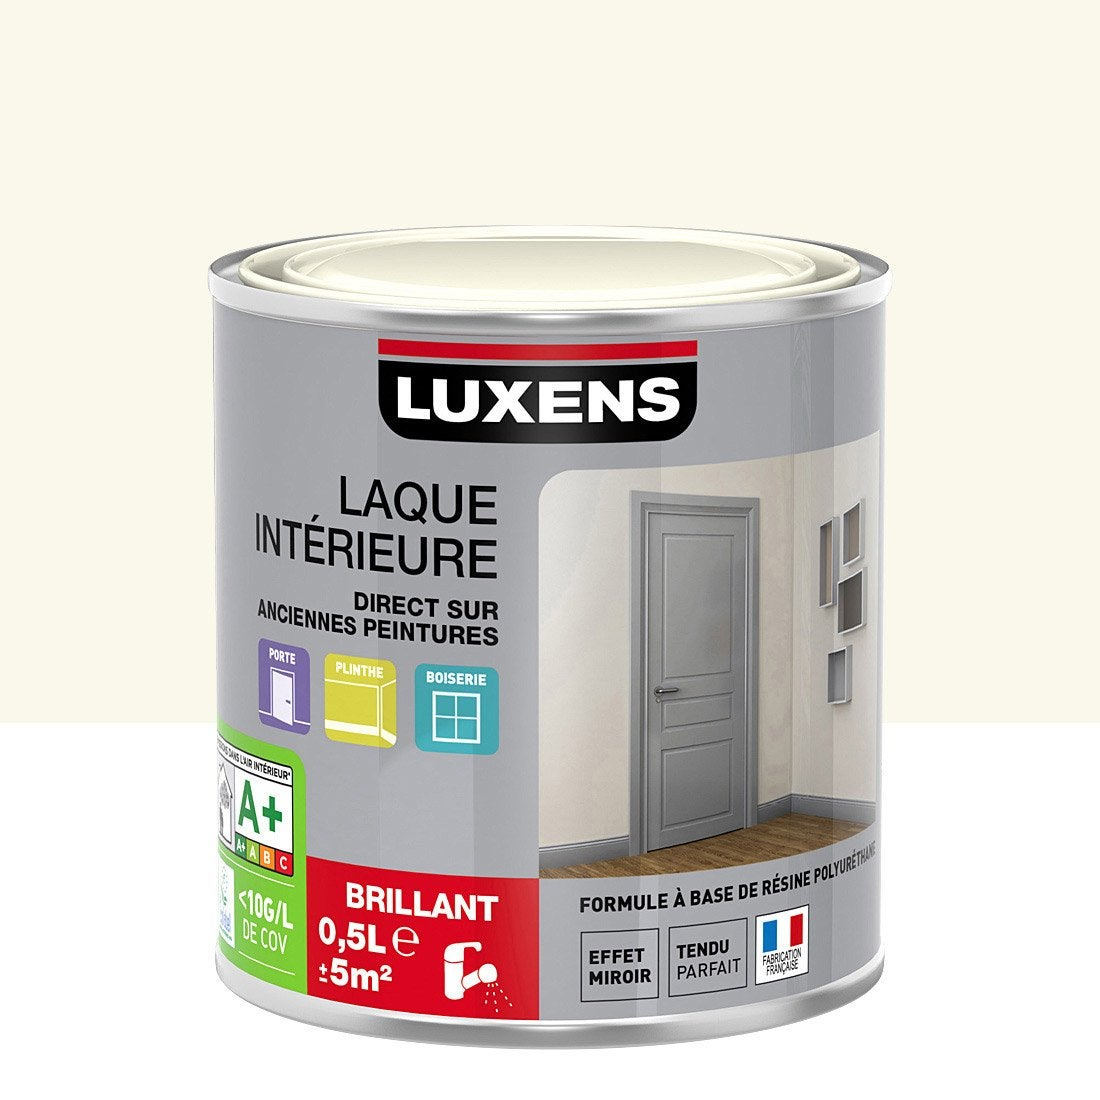 peinture blanc calcaire 4 luxens laque brillante 0 5 l leroy merlin. Black Bedroom Furniture Sets. Home Design Ideas